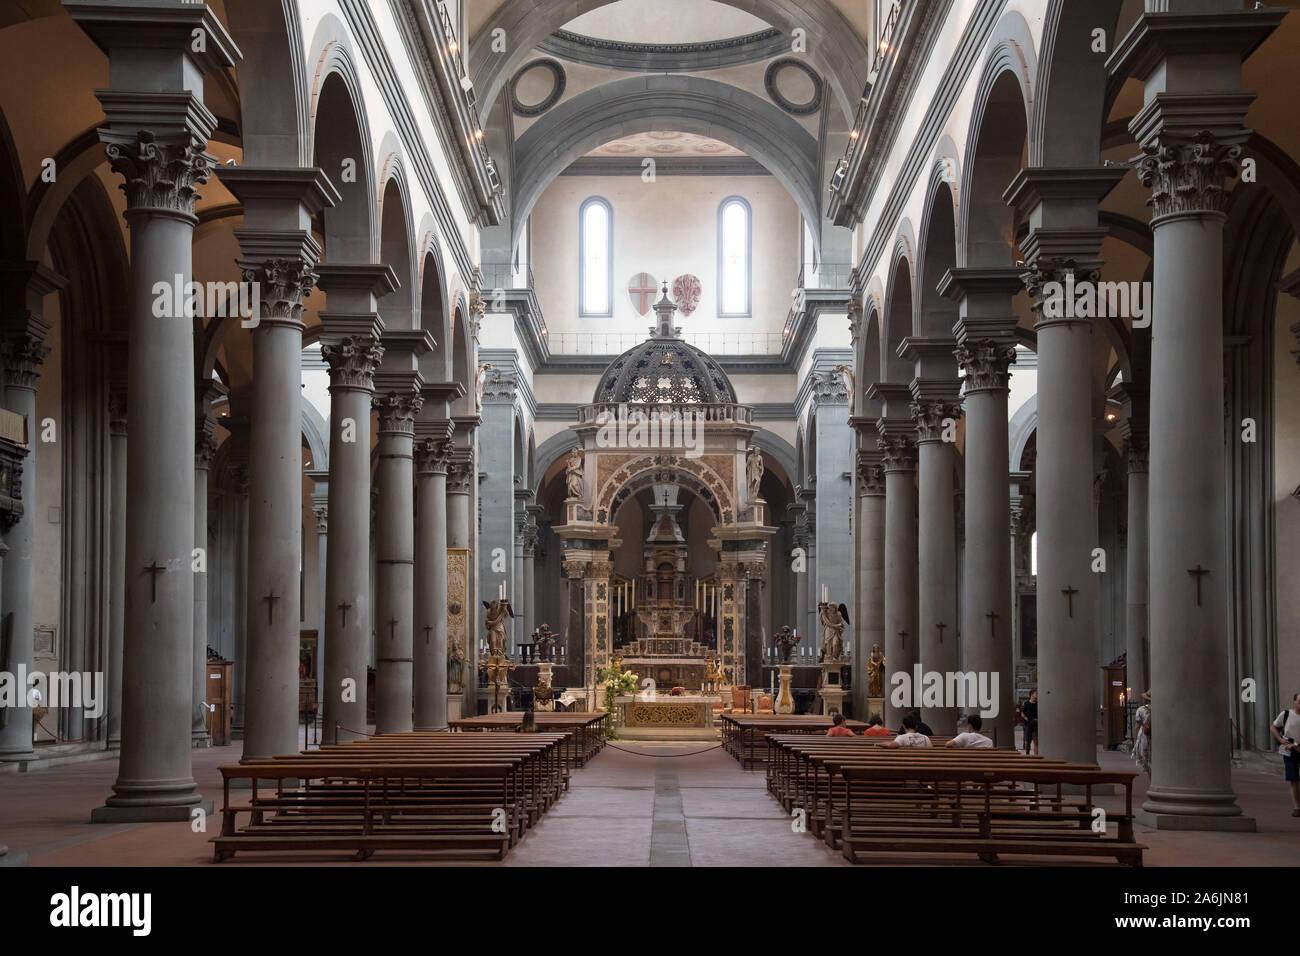 Renaissance Basilica di Santo Spirito (Basilica of the Holy Spirit) built in XV designed by Filippo Brunelleschi in Historic Centre of Florence listed Stock Photo